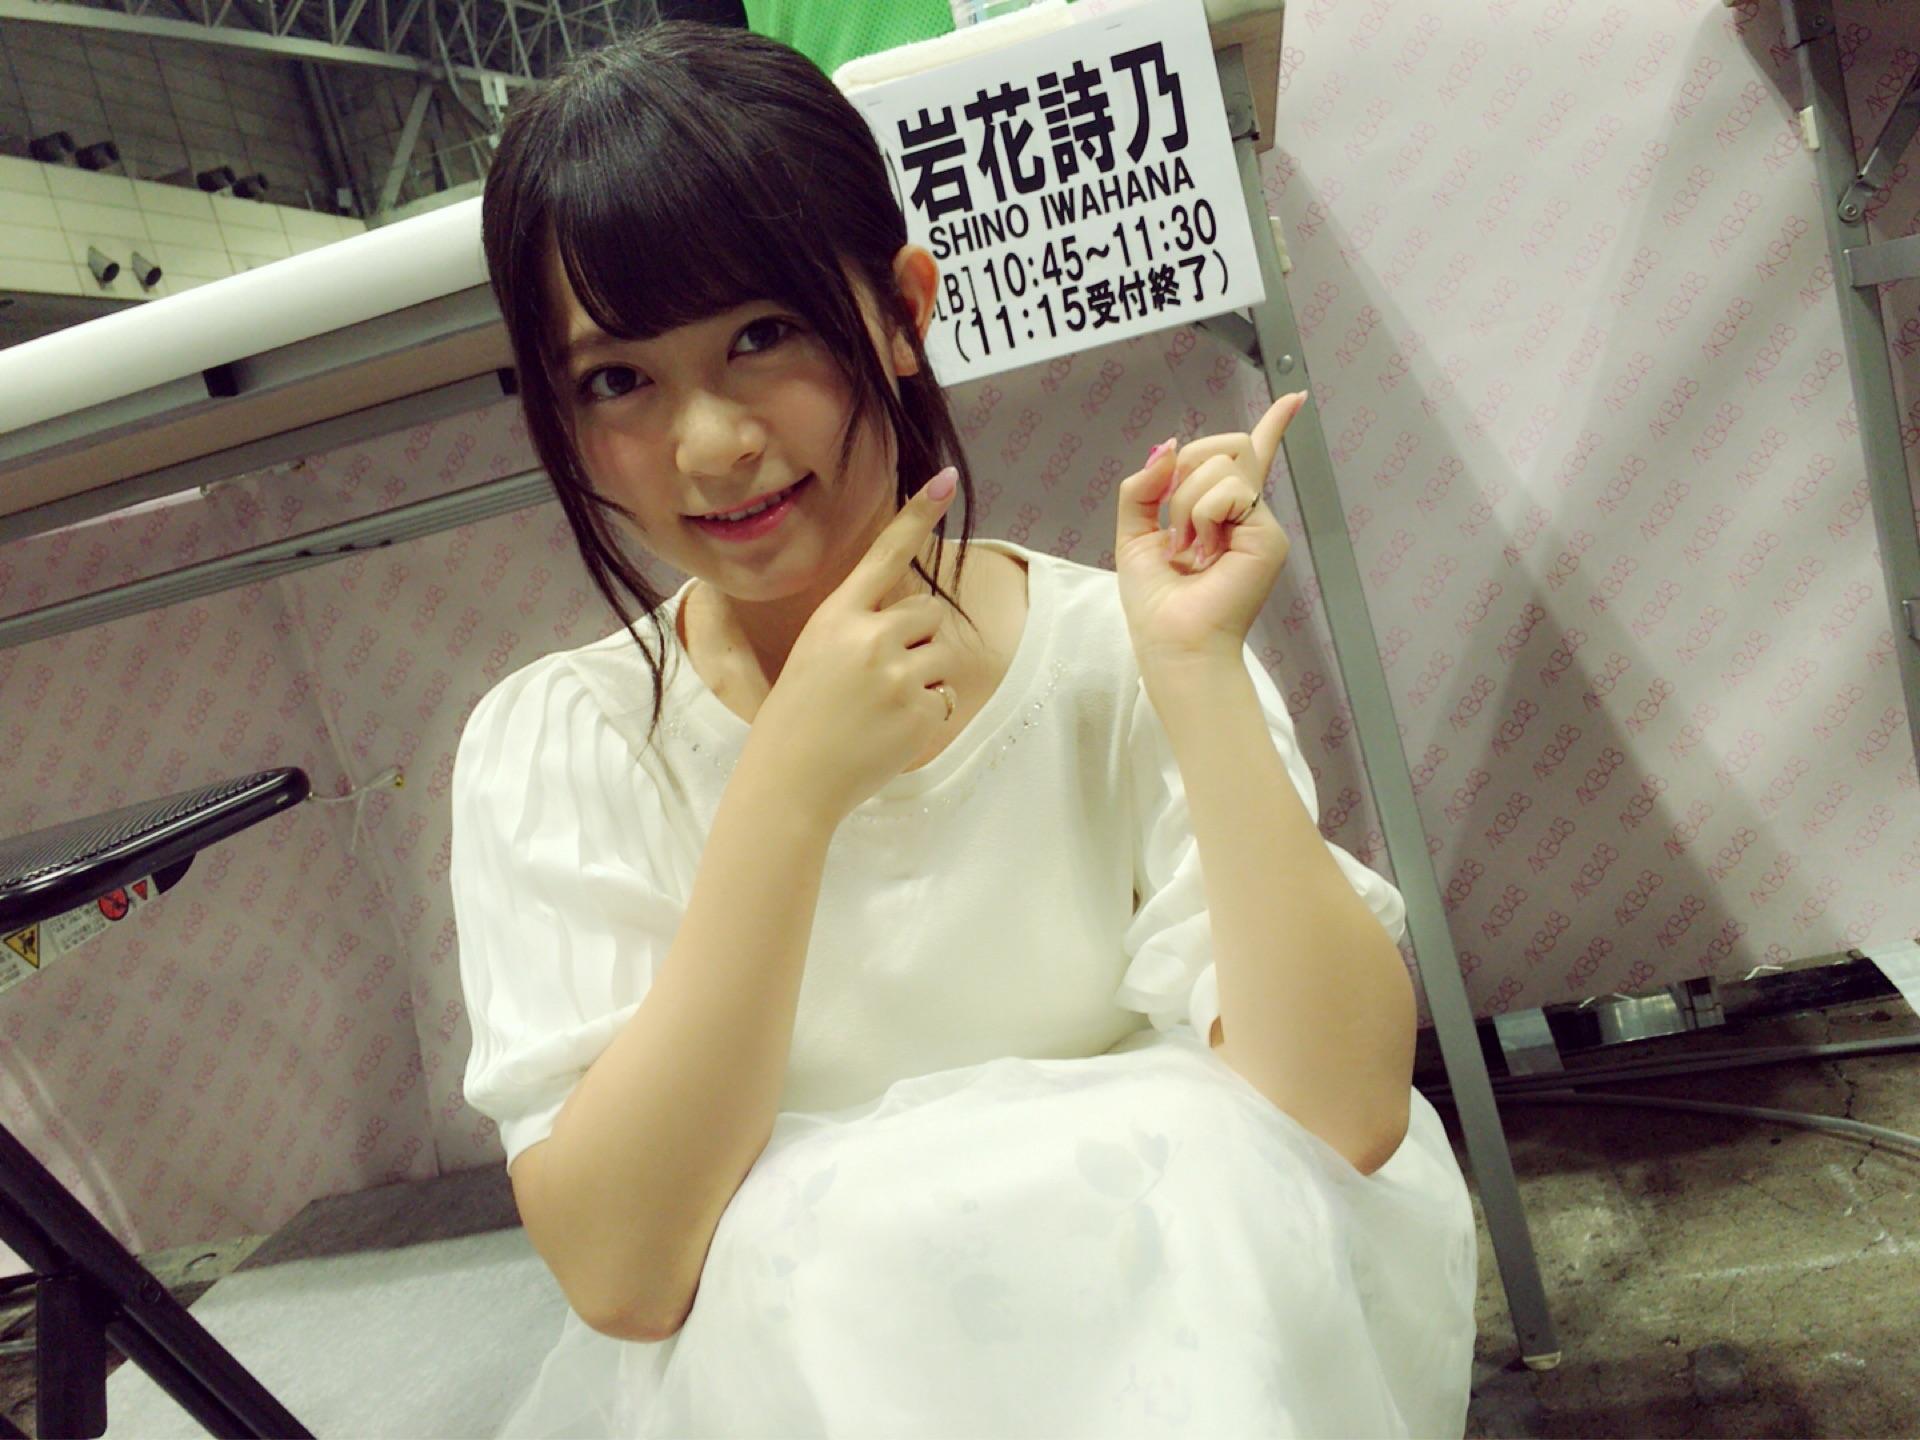 【HKT48】岩花詩乃応援スレ☆9【大草原w】©2ch.netYouTube動画>8本 ->画像>1790枚